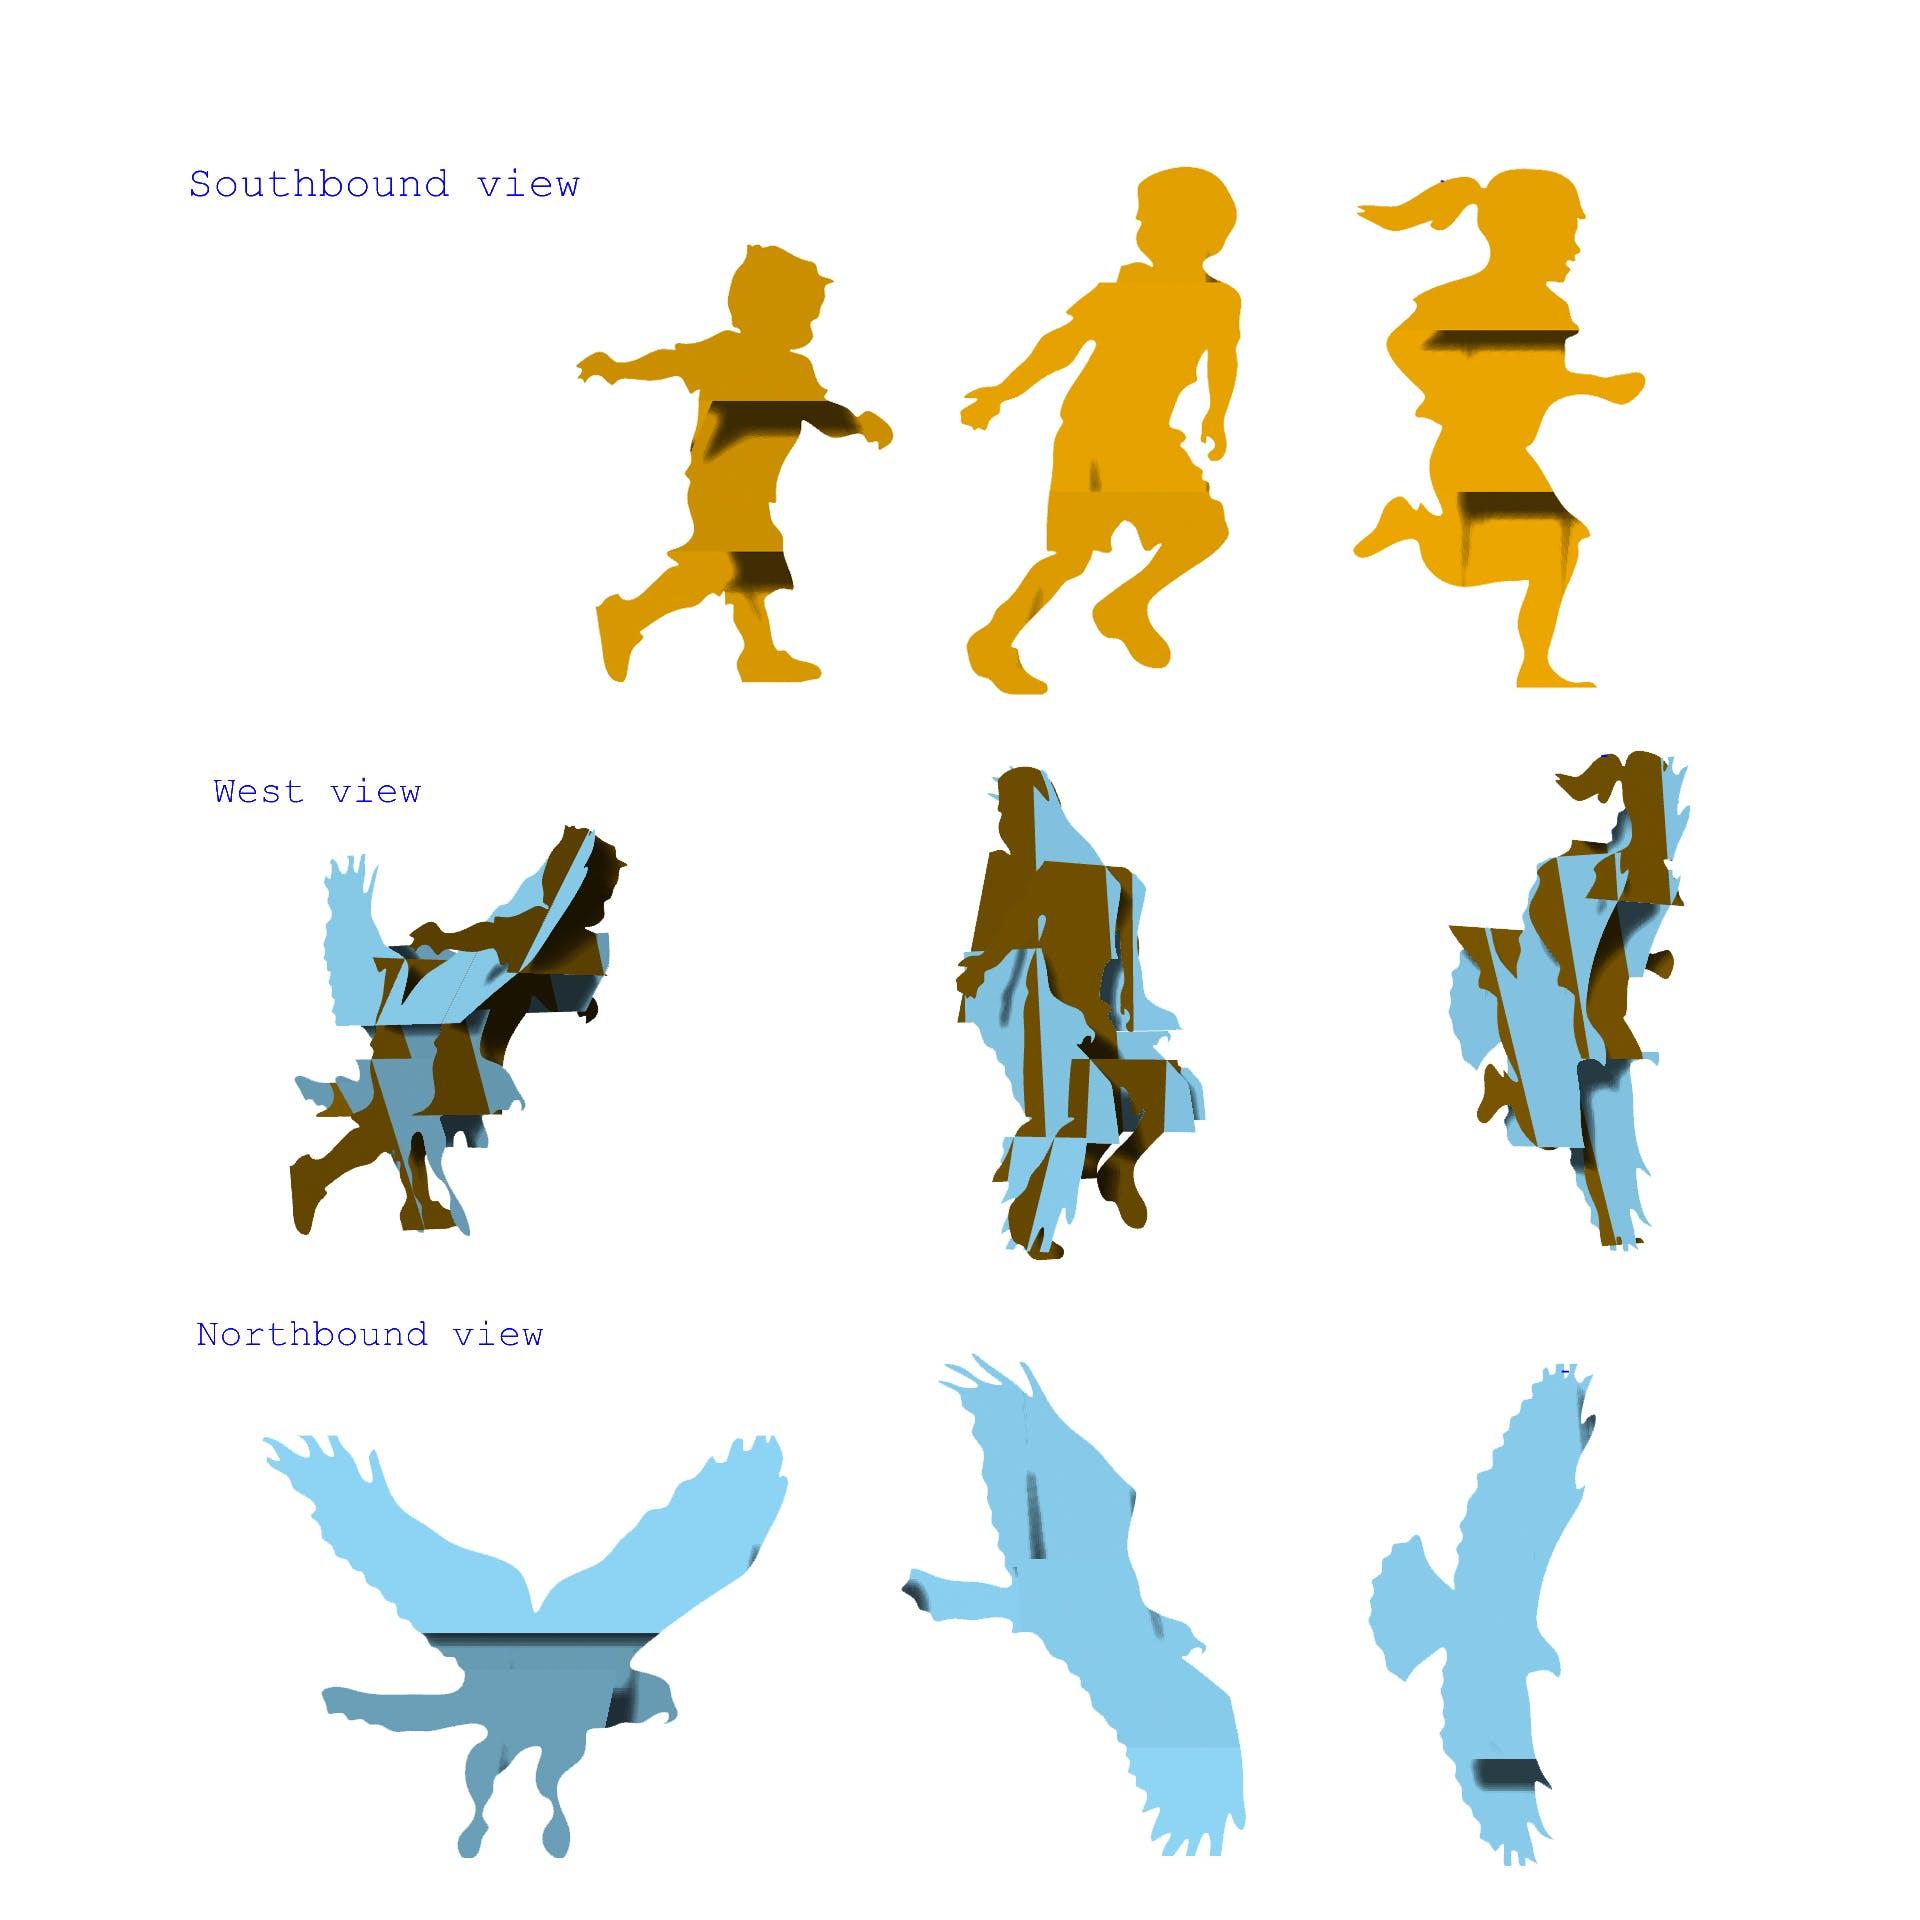 Joe Norman - proposed image 2